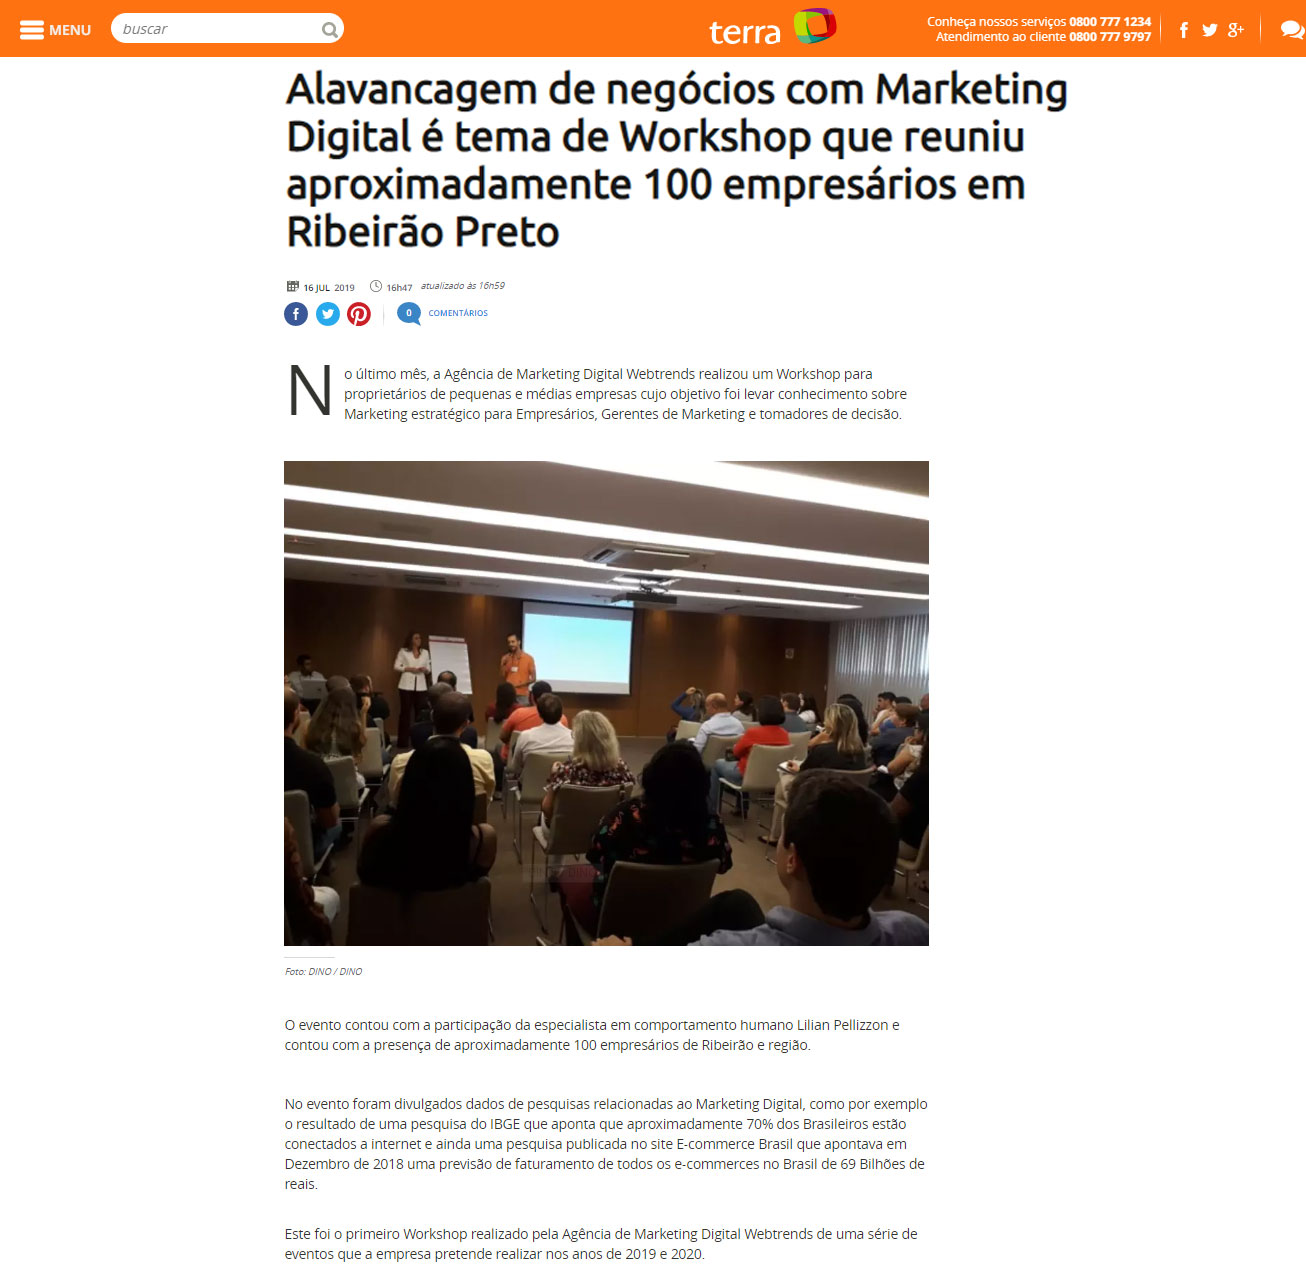 https://webtrends.net.br/wp-content/uploads/2019/09/terra2.jpg